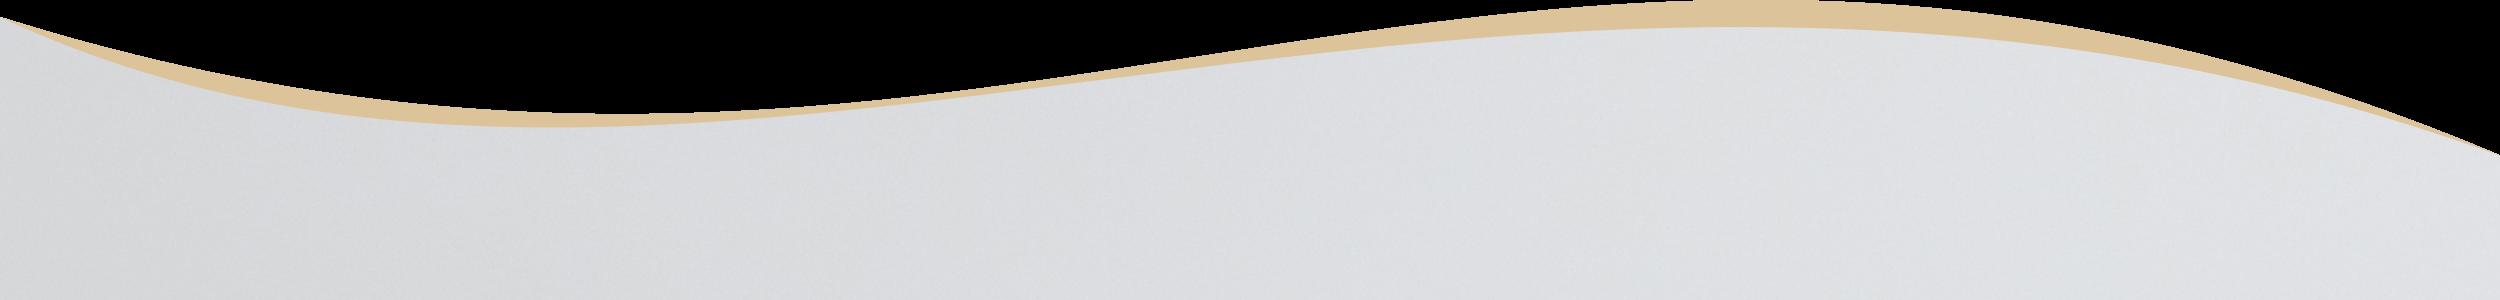 wave_beige_grau